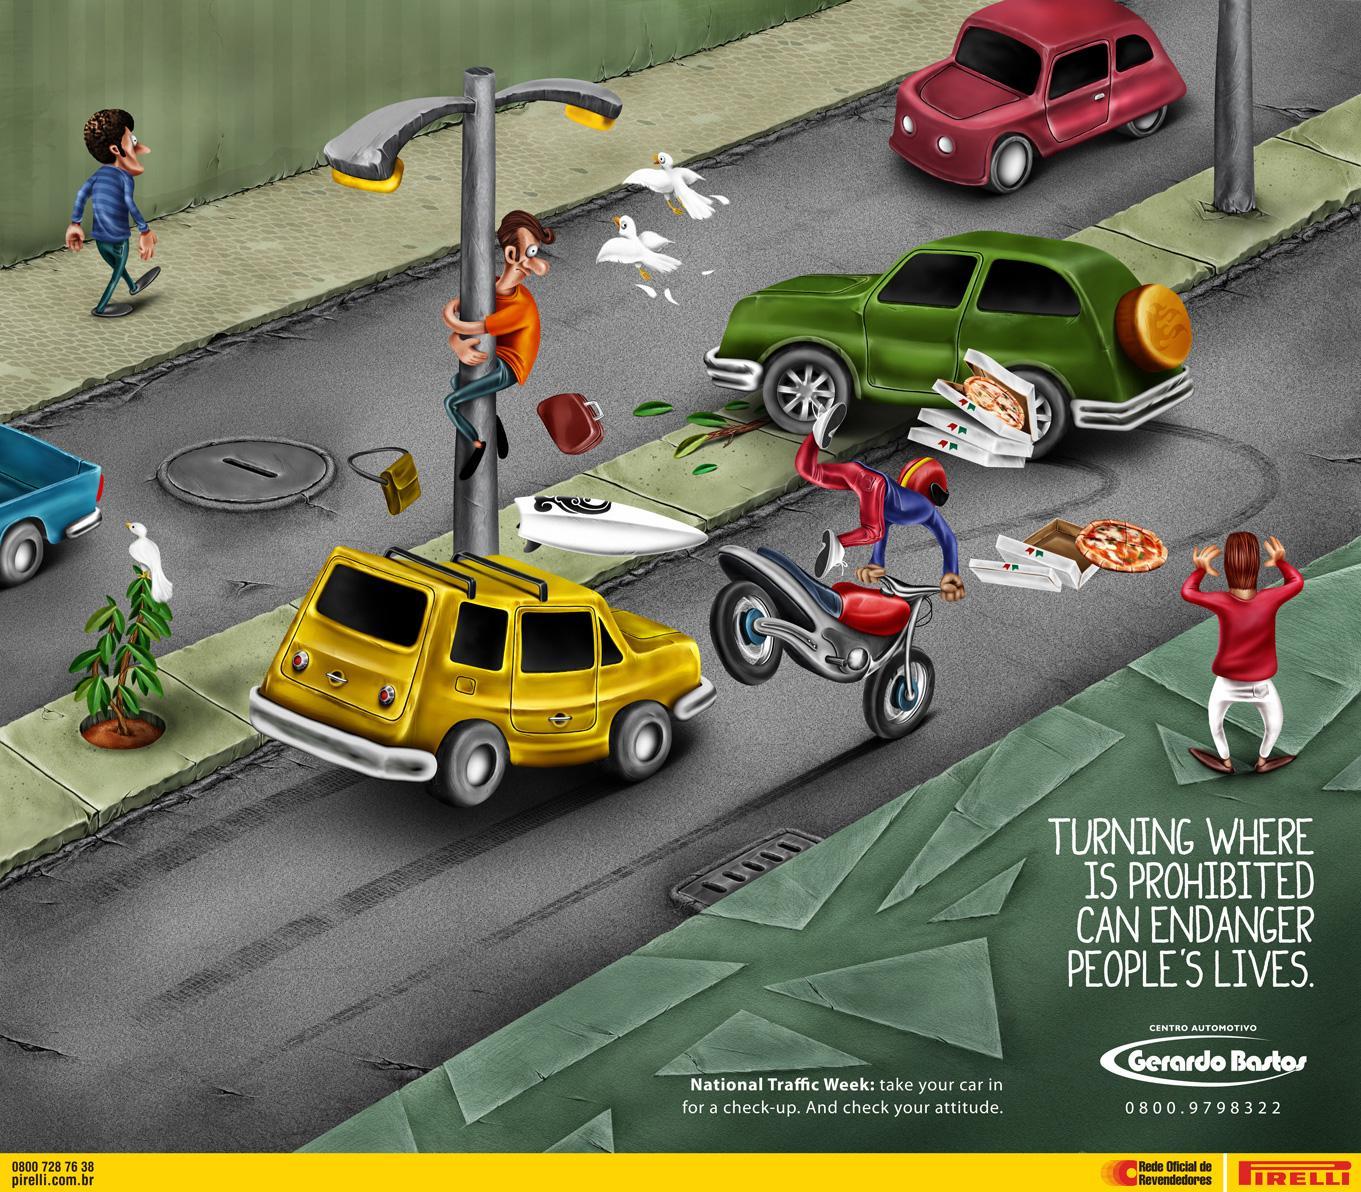 Gerardo Bastos Print Ad -  Turning